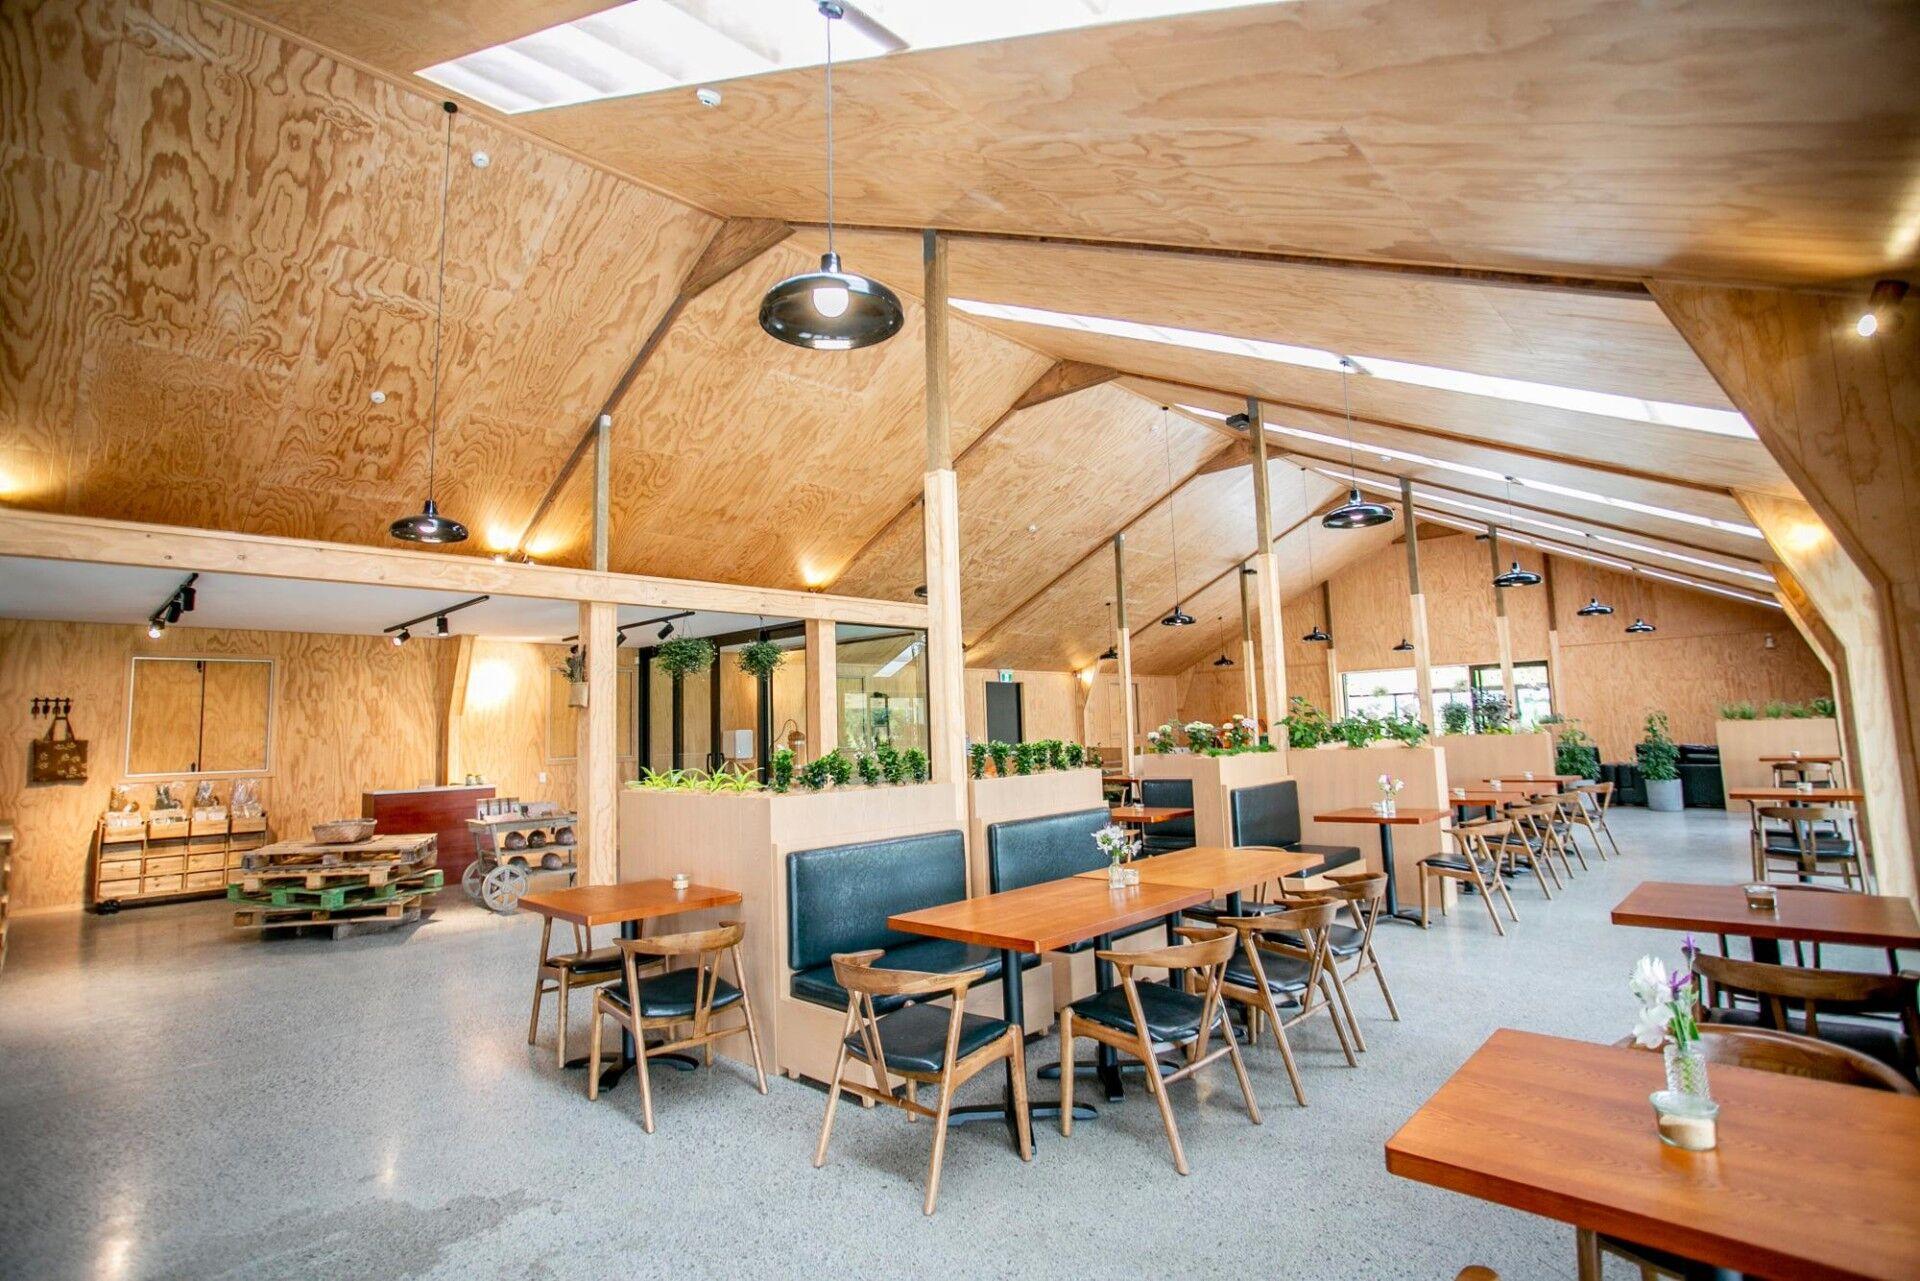 Lavender Farm Cafe inside